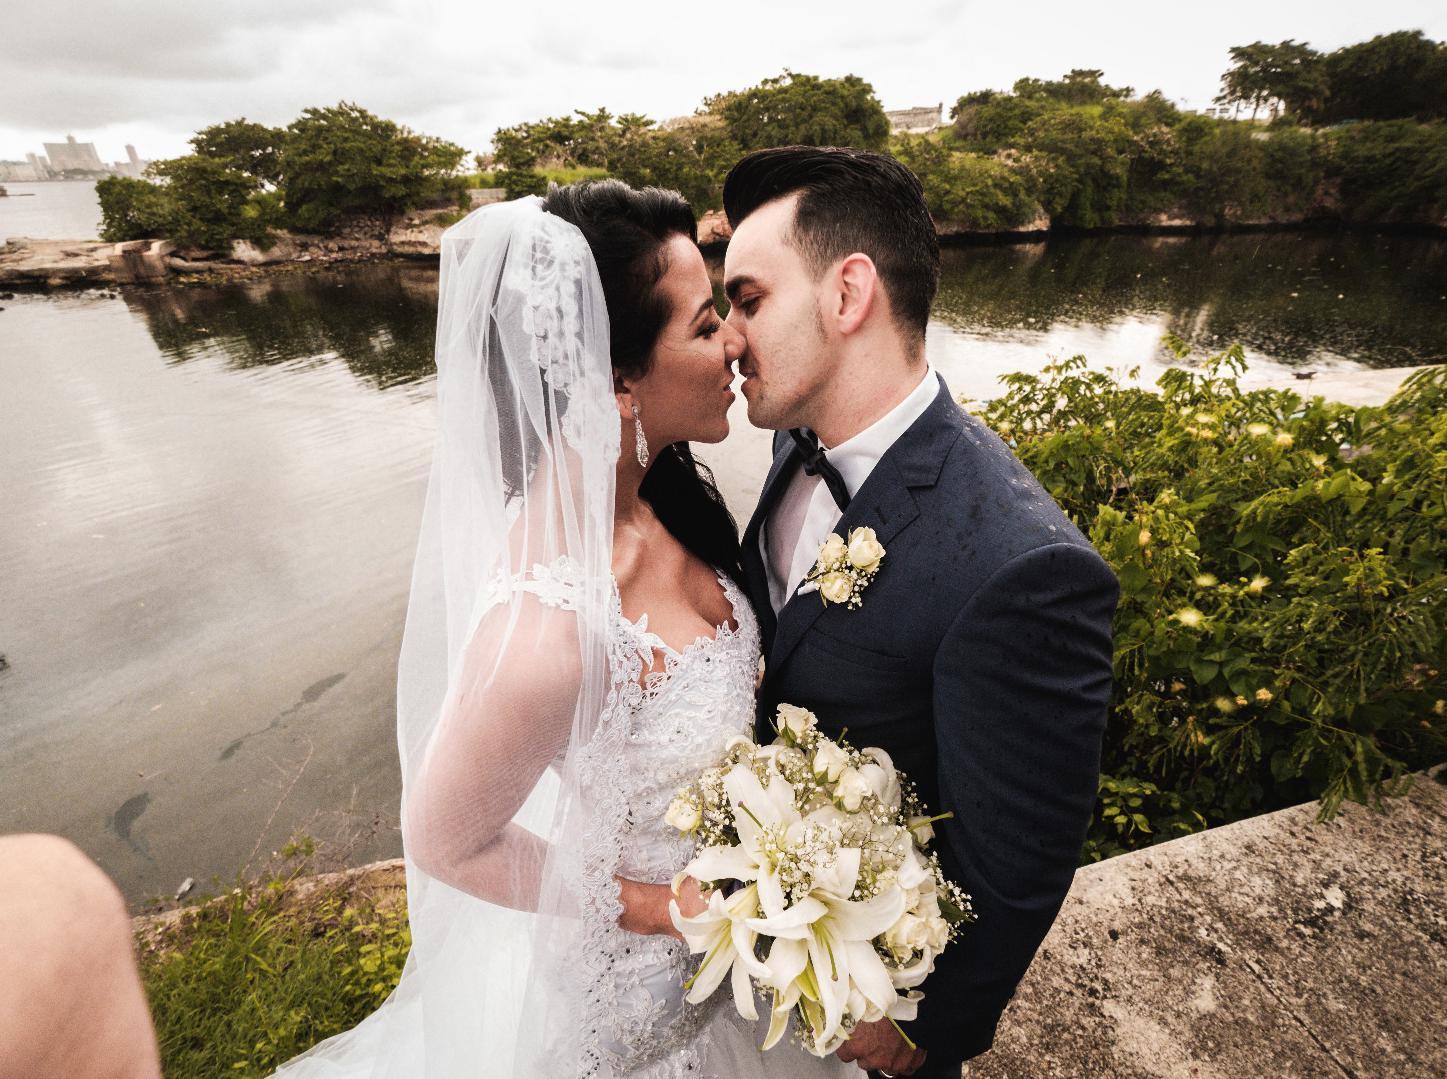 bodas-sin-clasificar-sin-tema-cuba-35692.jpg